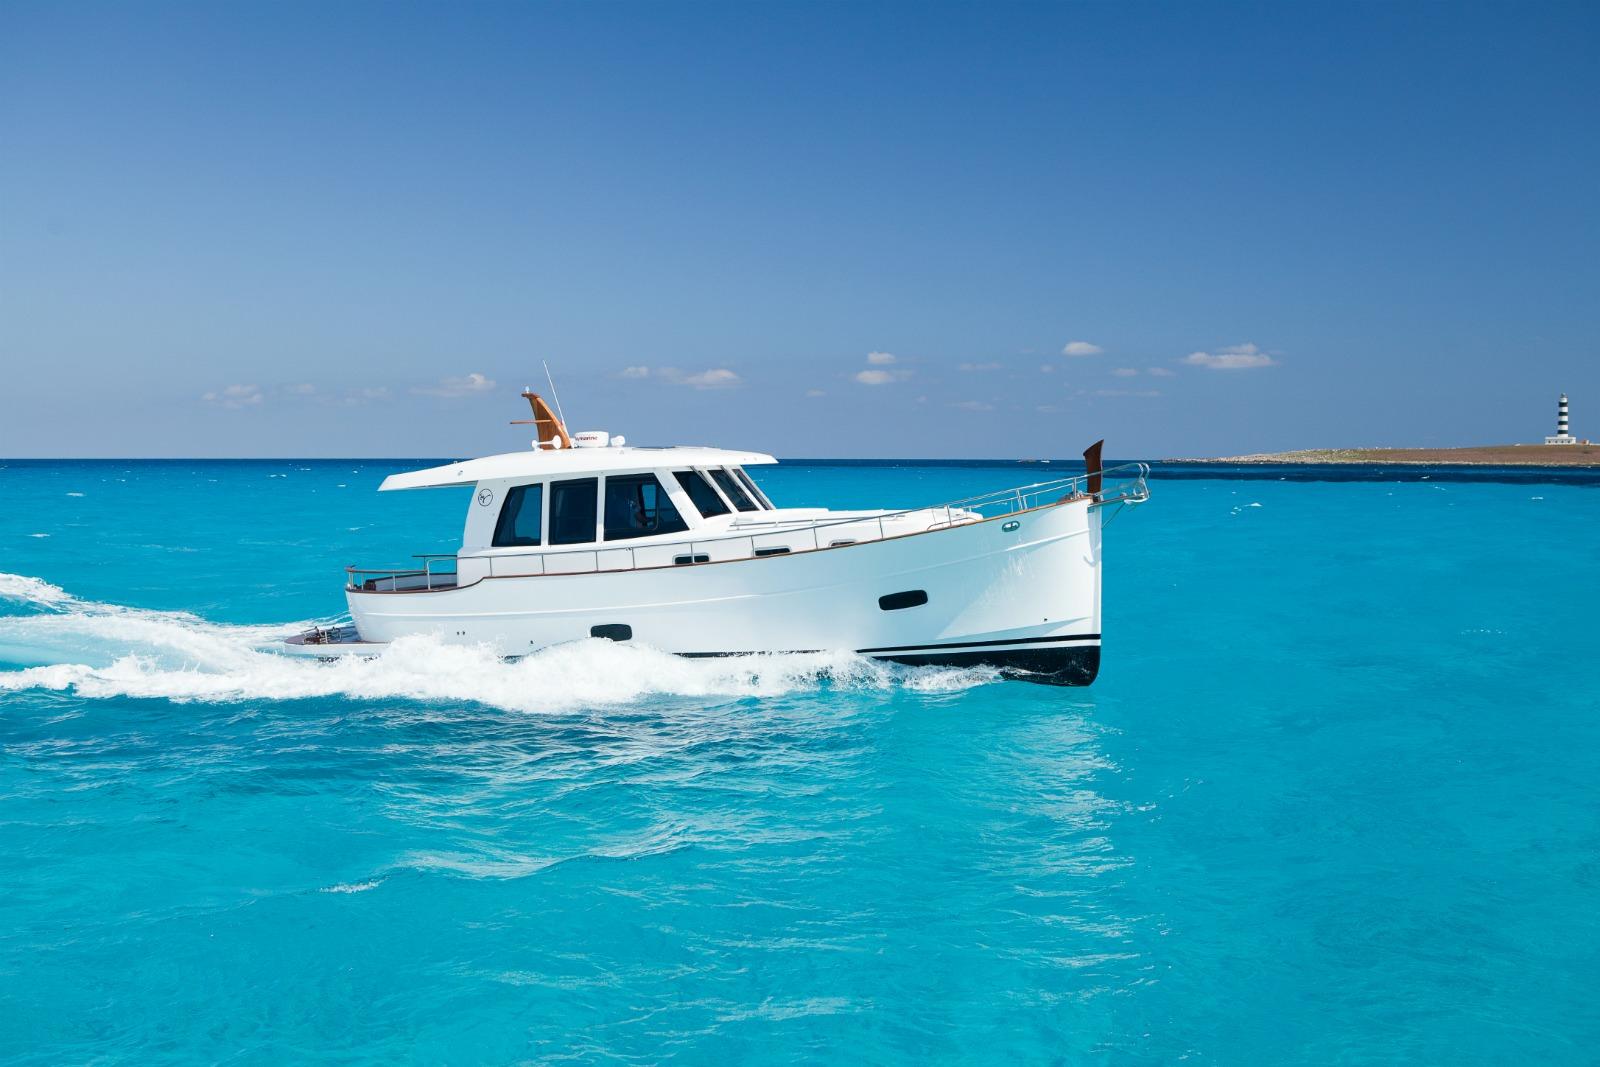 Islander 42 yacht for sale